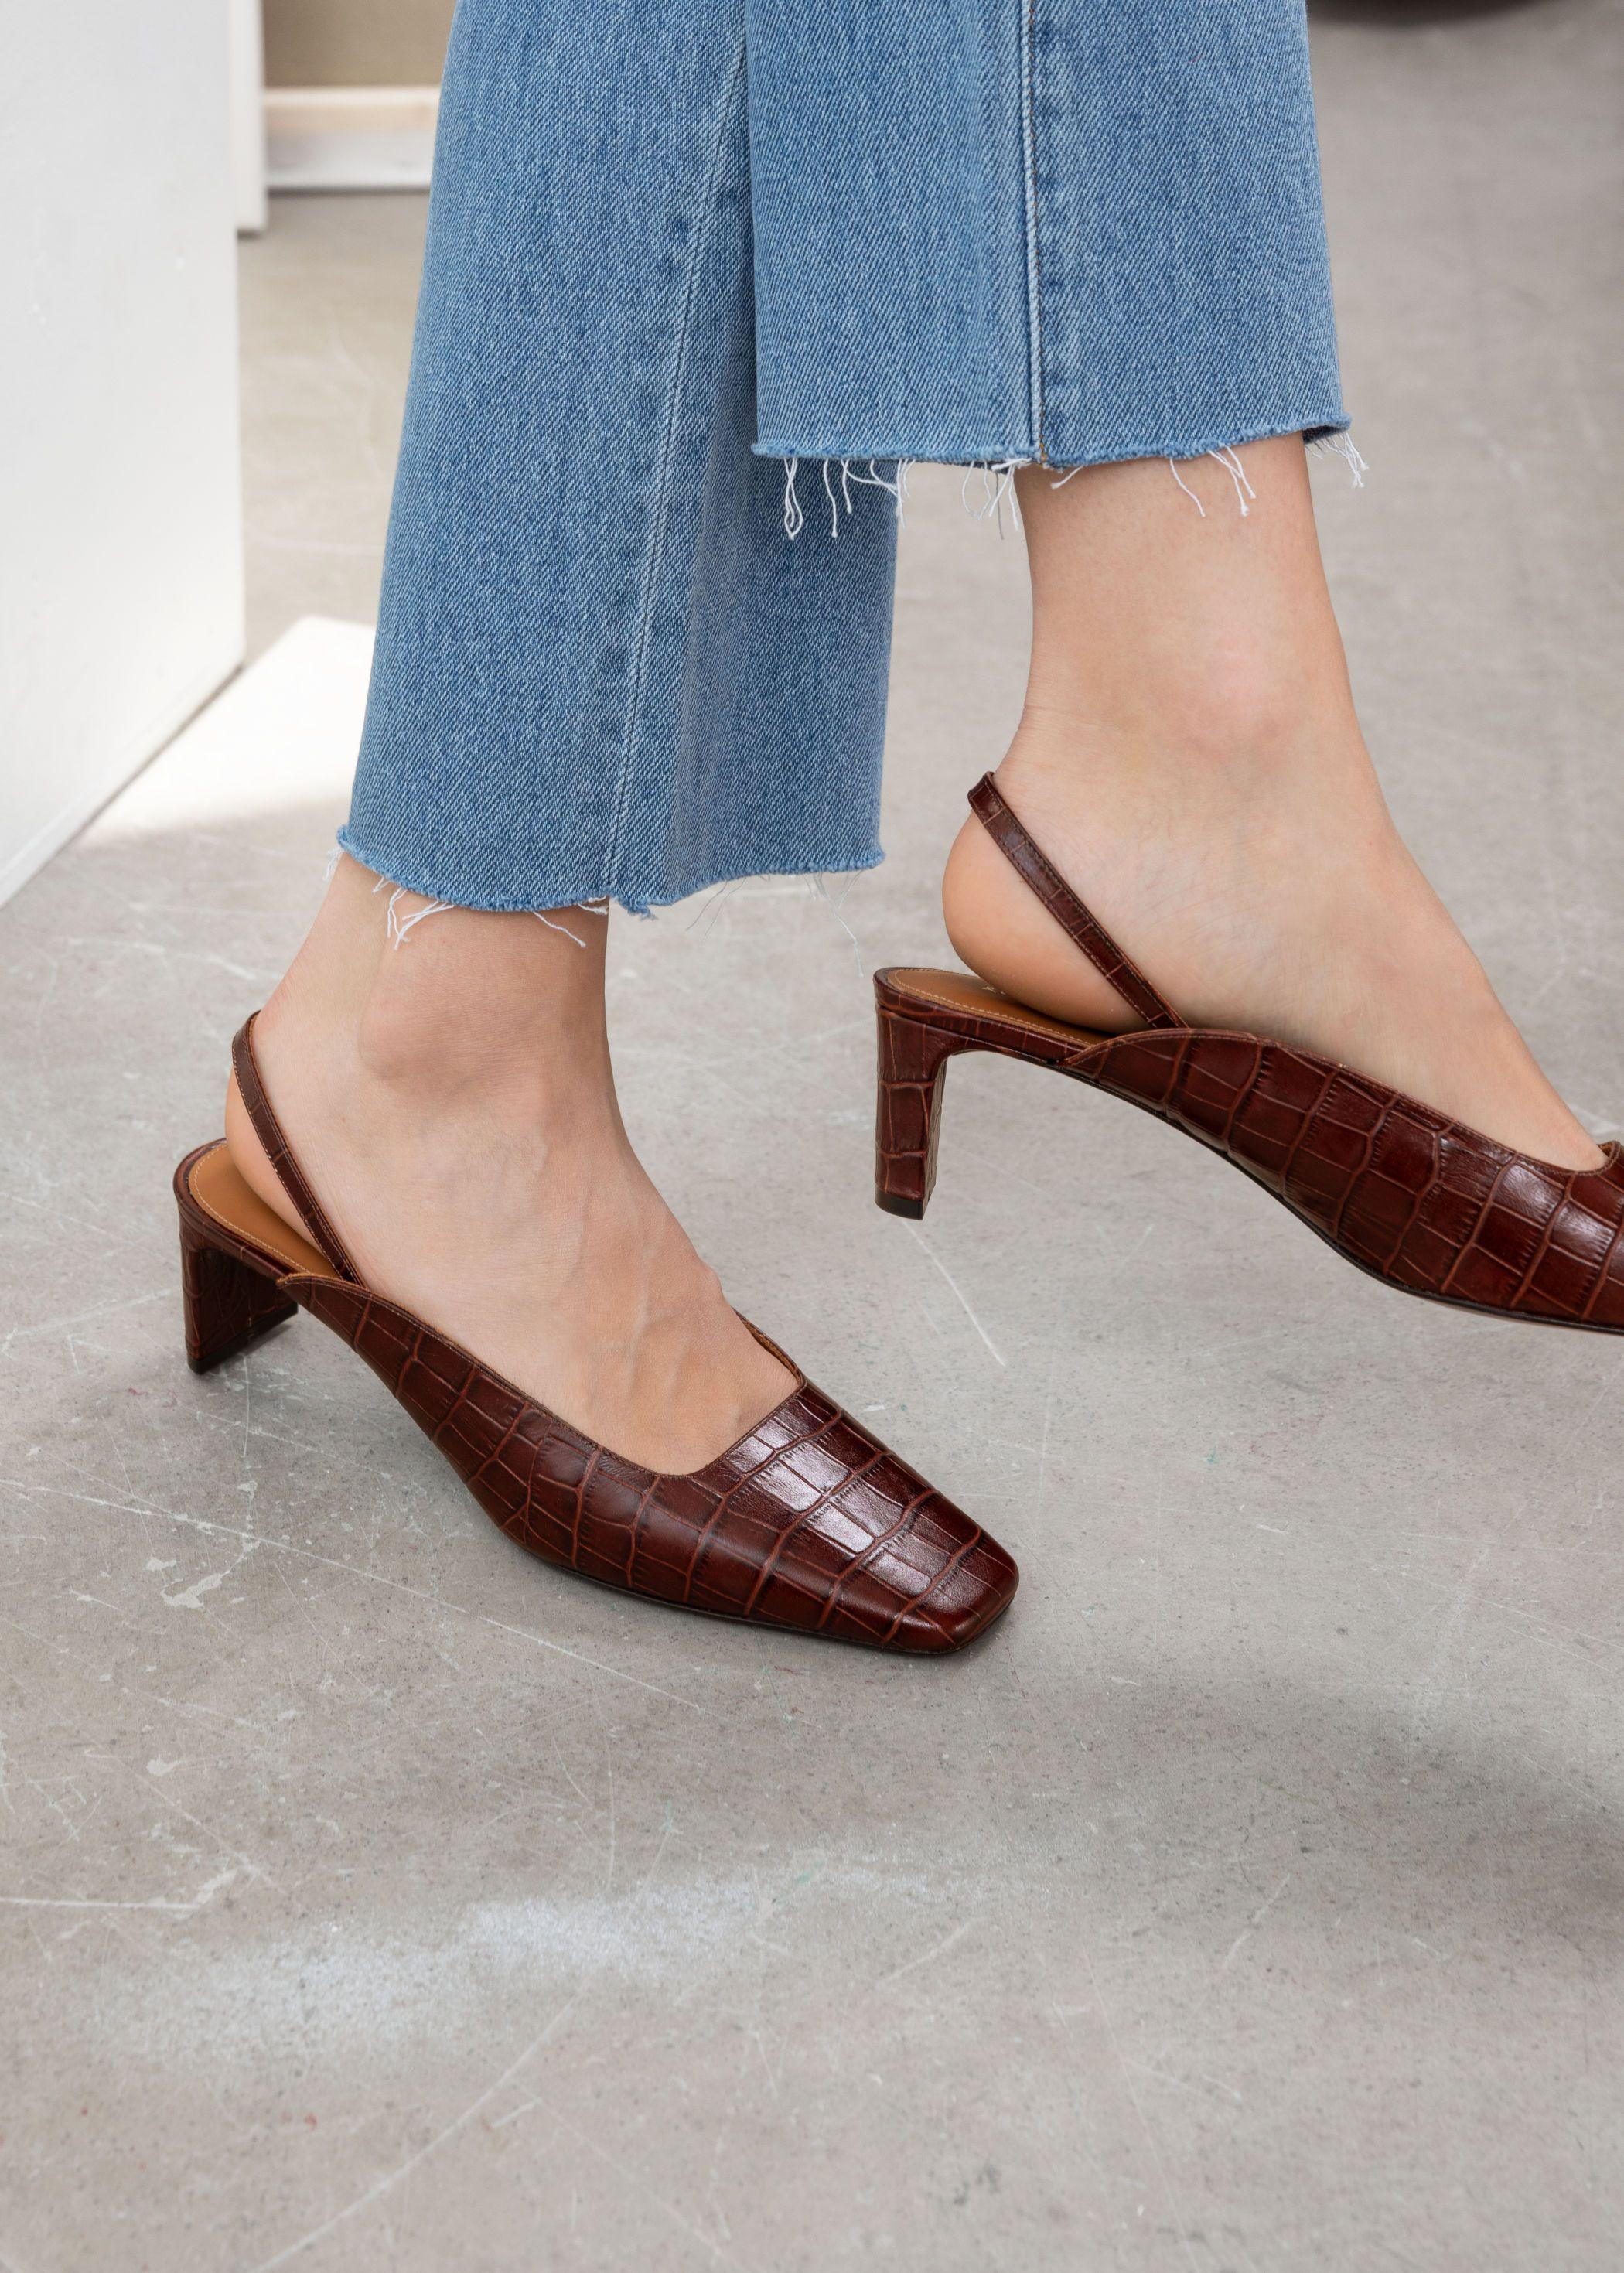 Pdp Casual Shoes Women Kitten Heels Heeled Mules